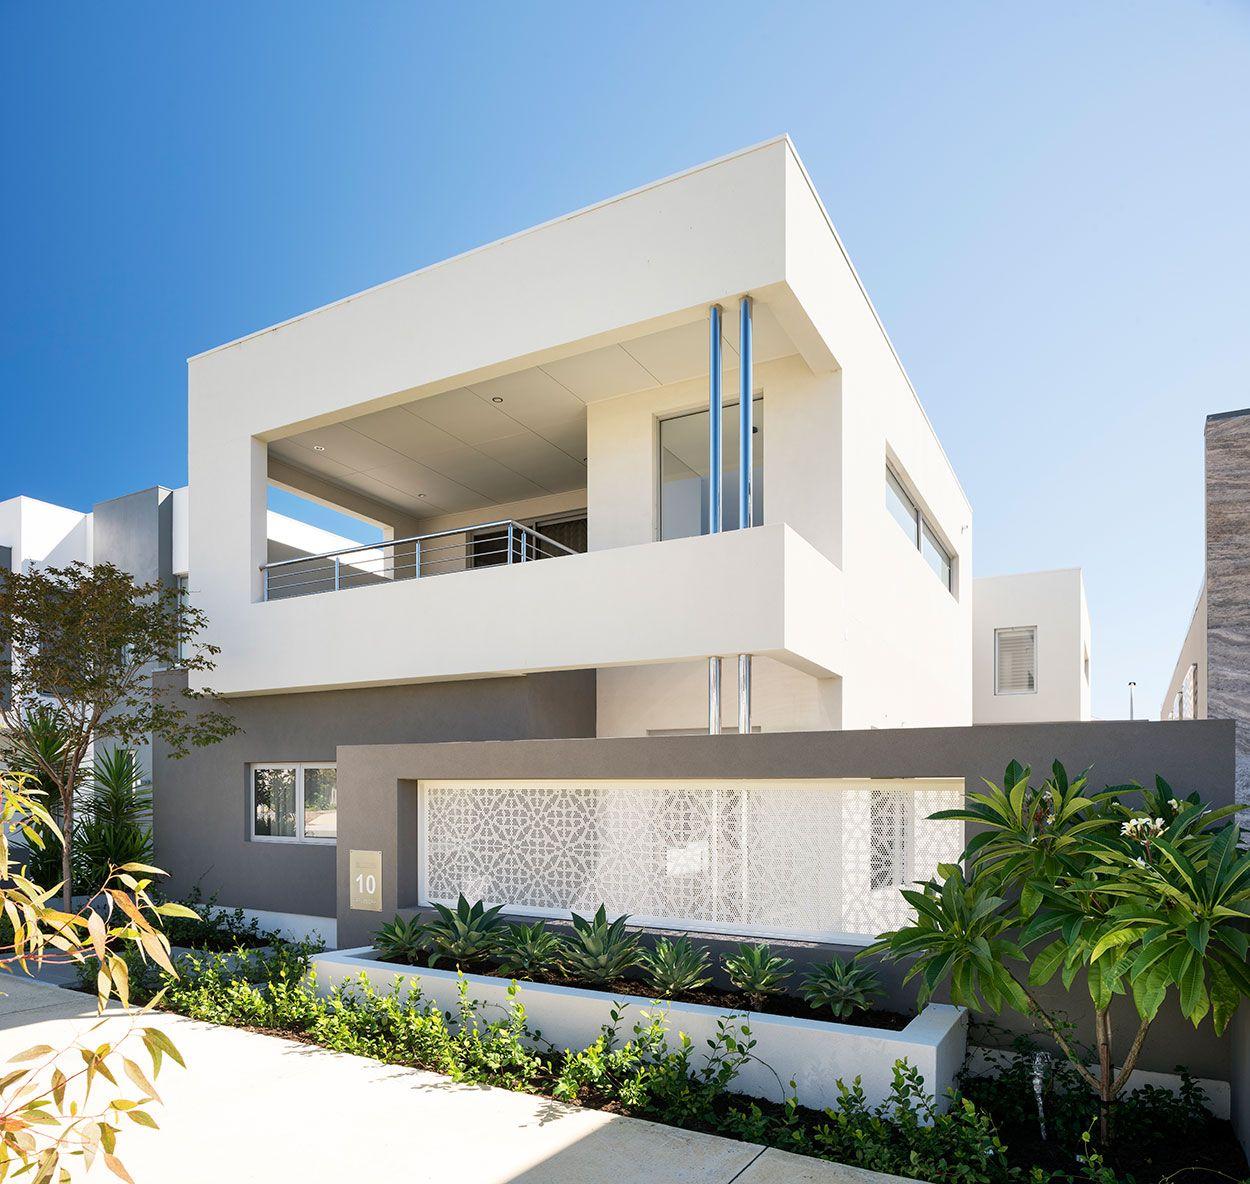 132 Casas Bonitas Modernas Fotos Lindas Design Exterior De